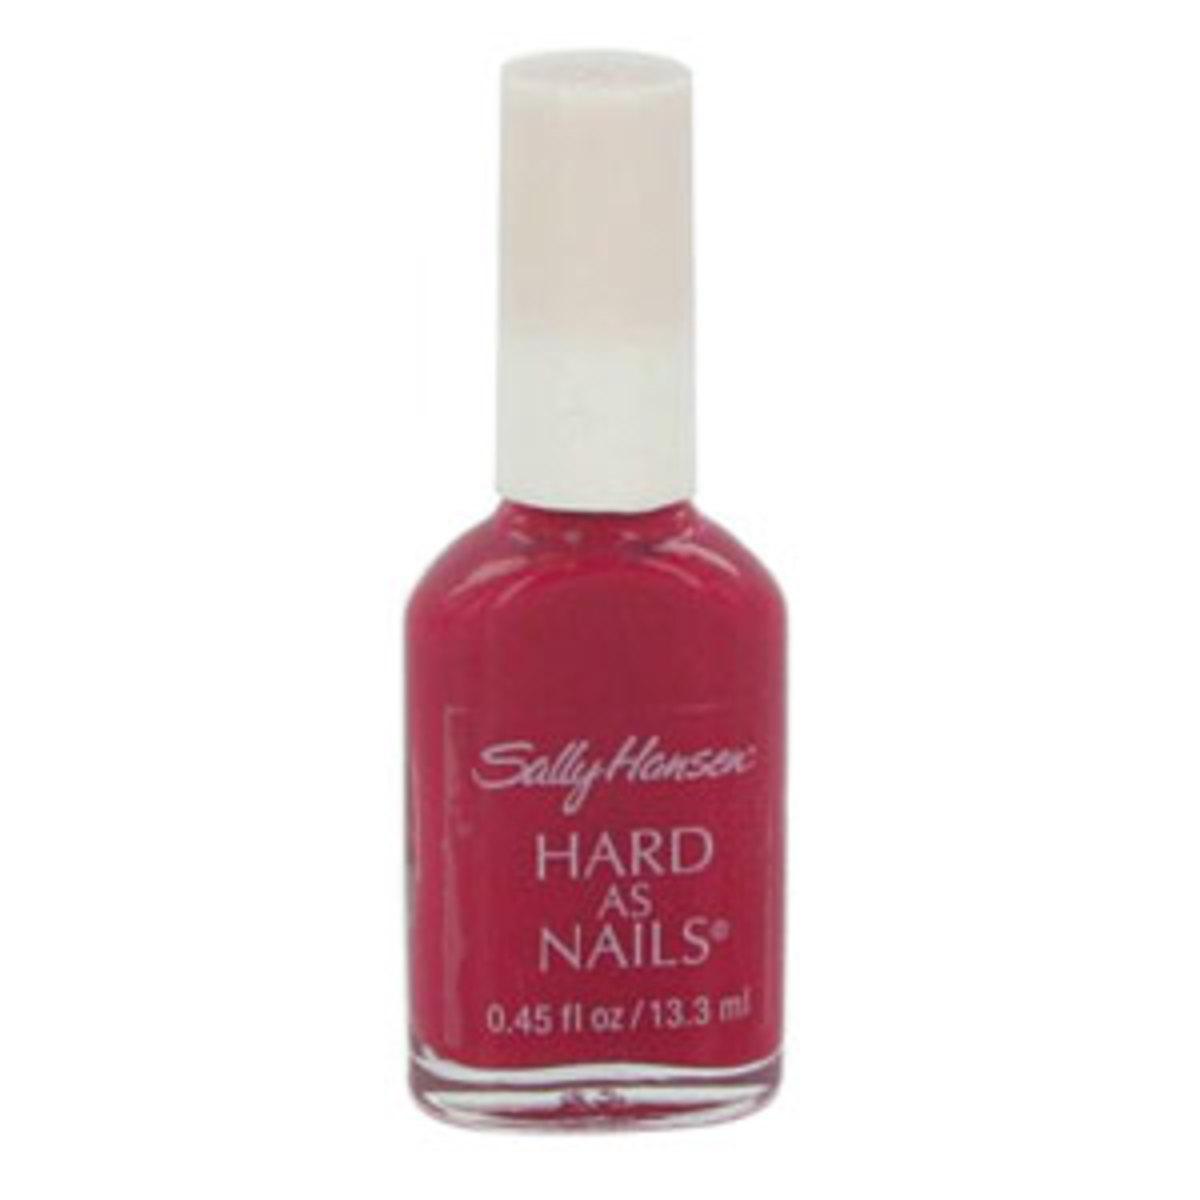 Sally-Hansen-nail-polish